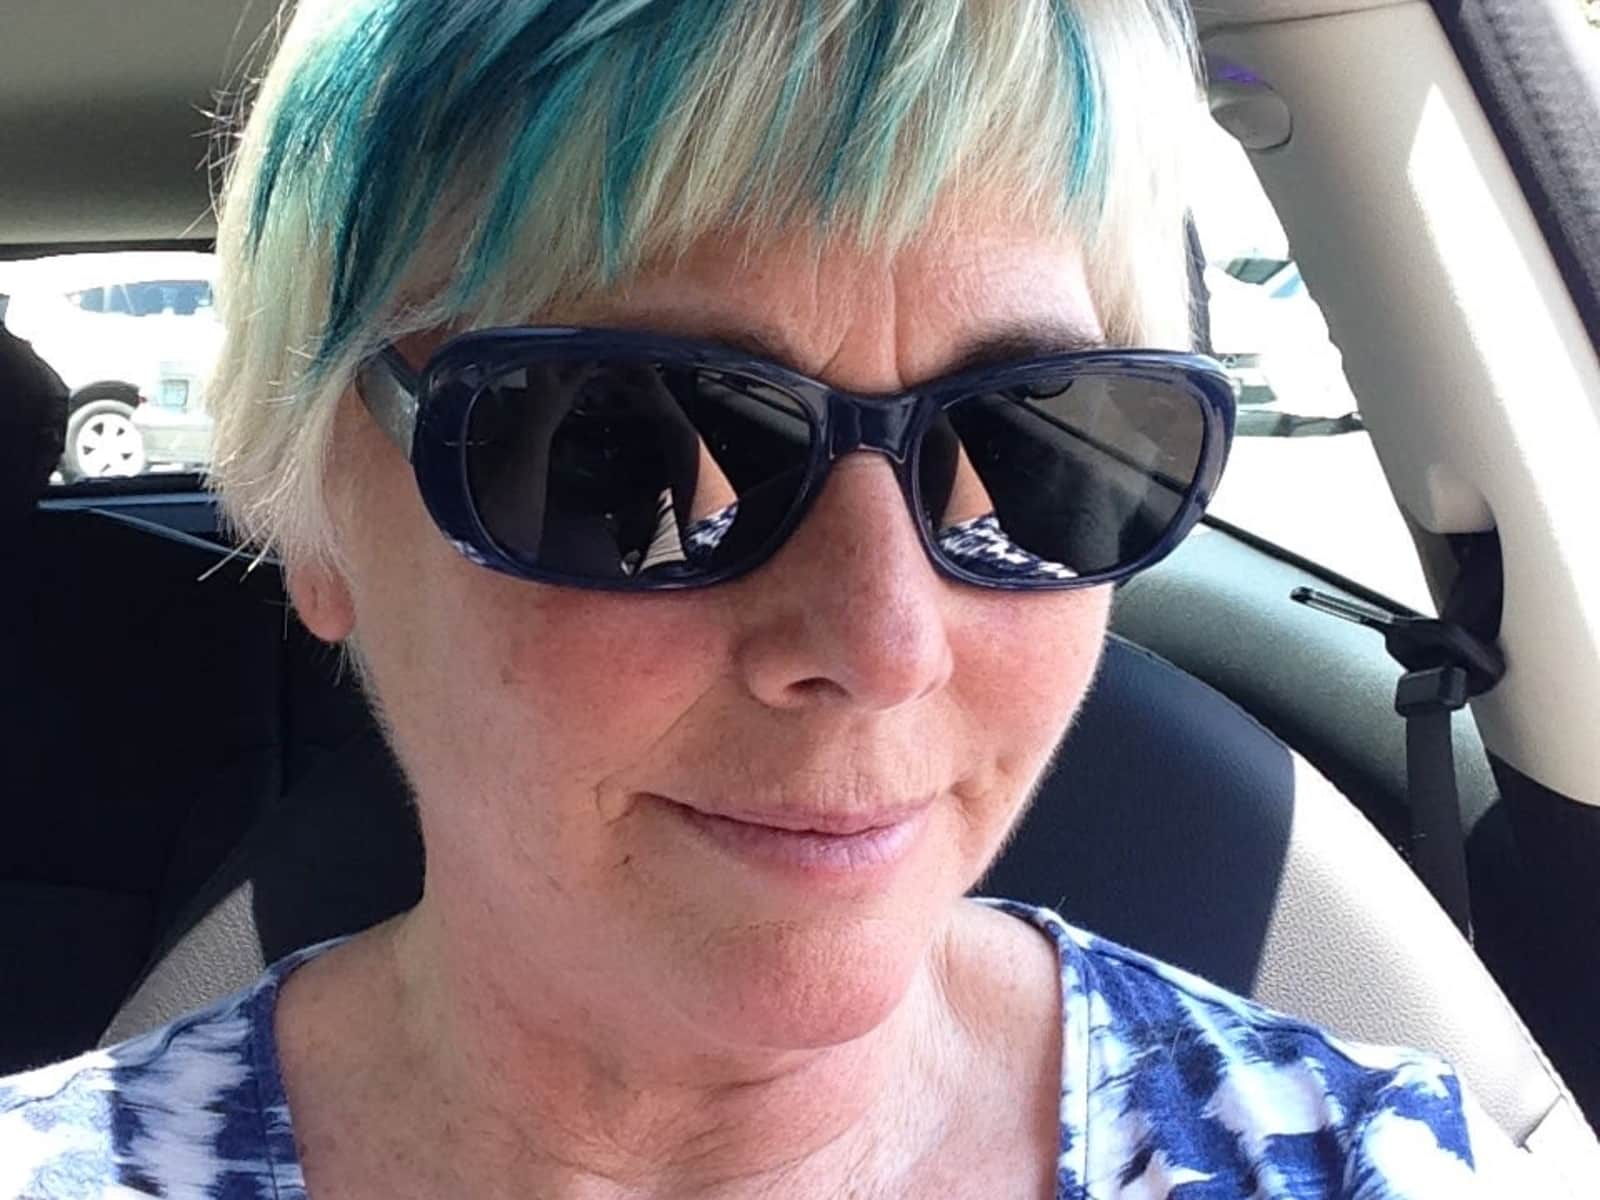 Kathy jo from Sedona, Arizona, United States